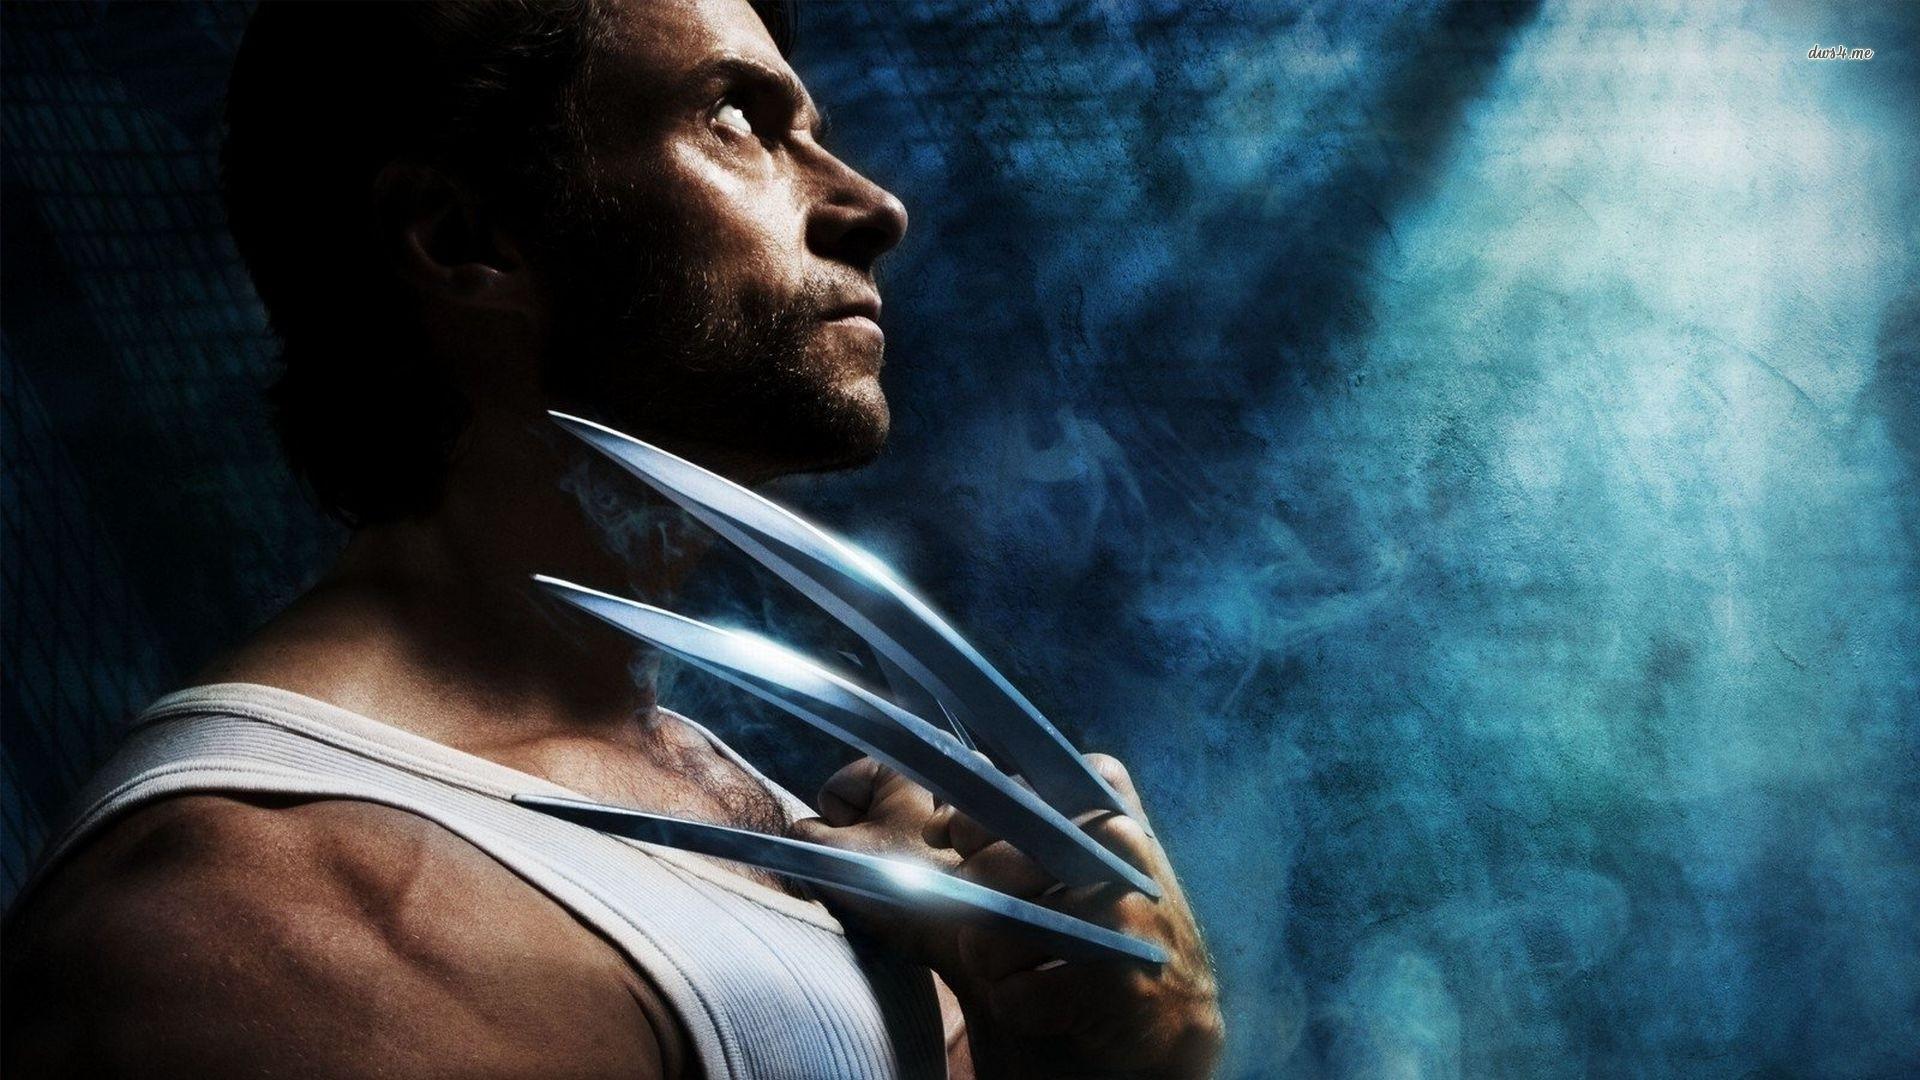 Hugh Jackman Wallpapers Hd: Wolverine Hugh Jackman Wallpaper 2018 (70+ Images